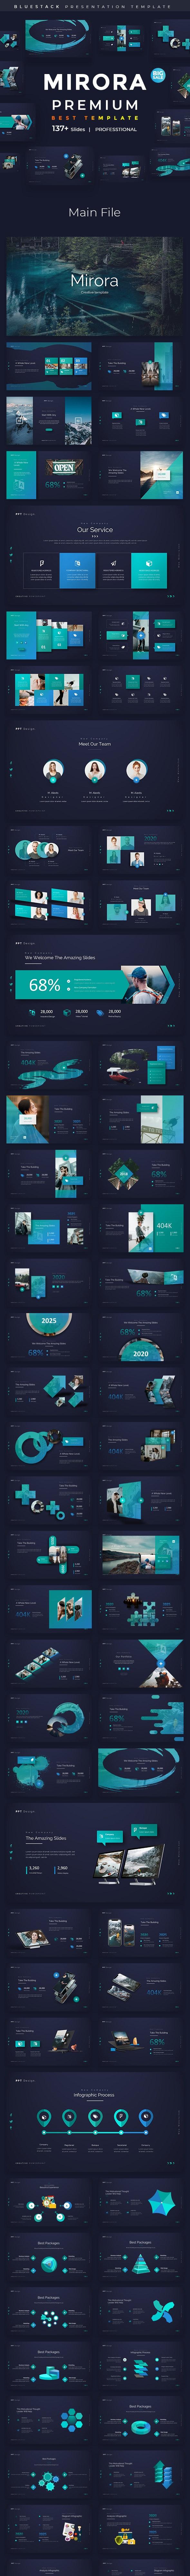 Mirora Premium Powerpoint Template - Creative PowerPoint Templates